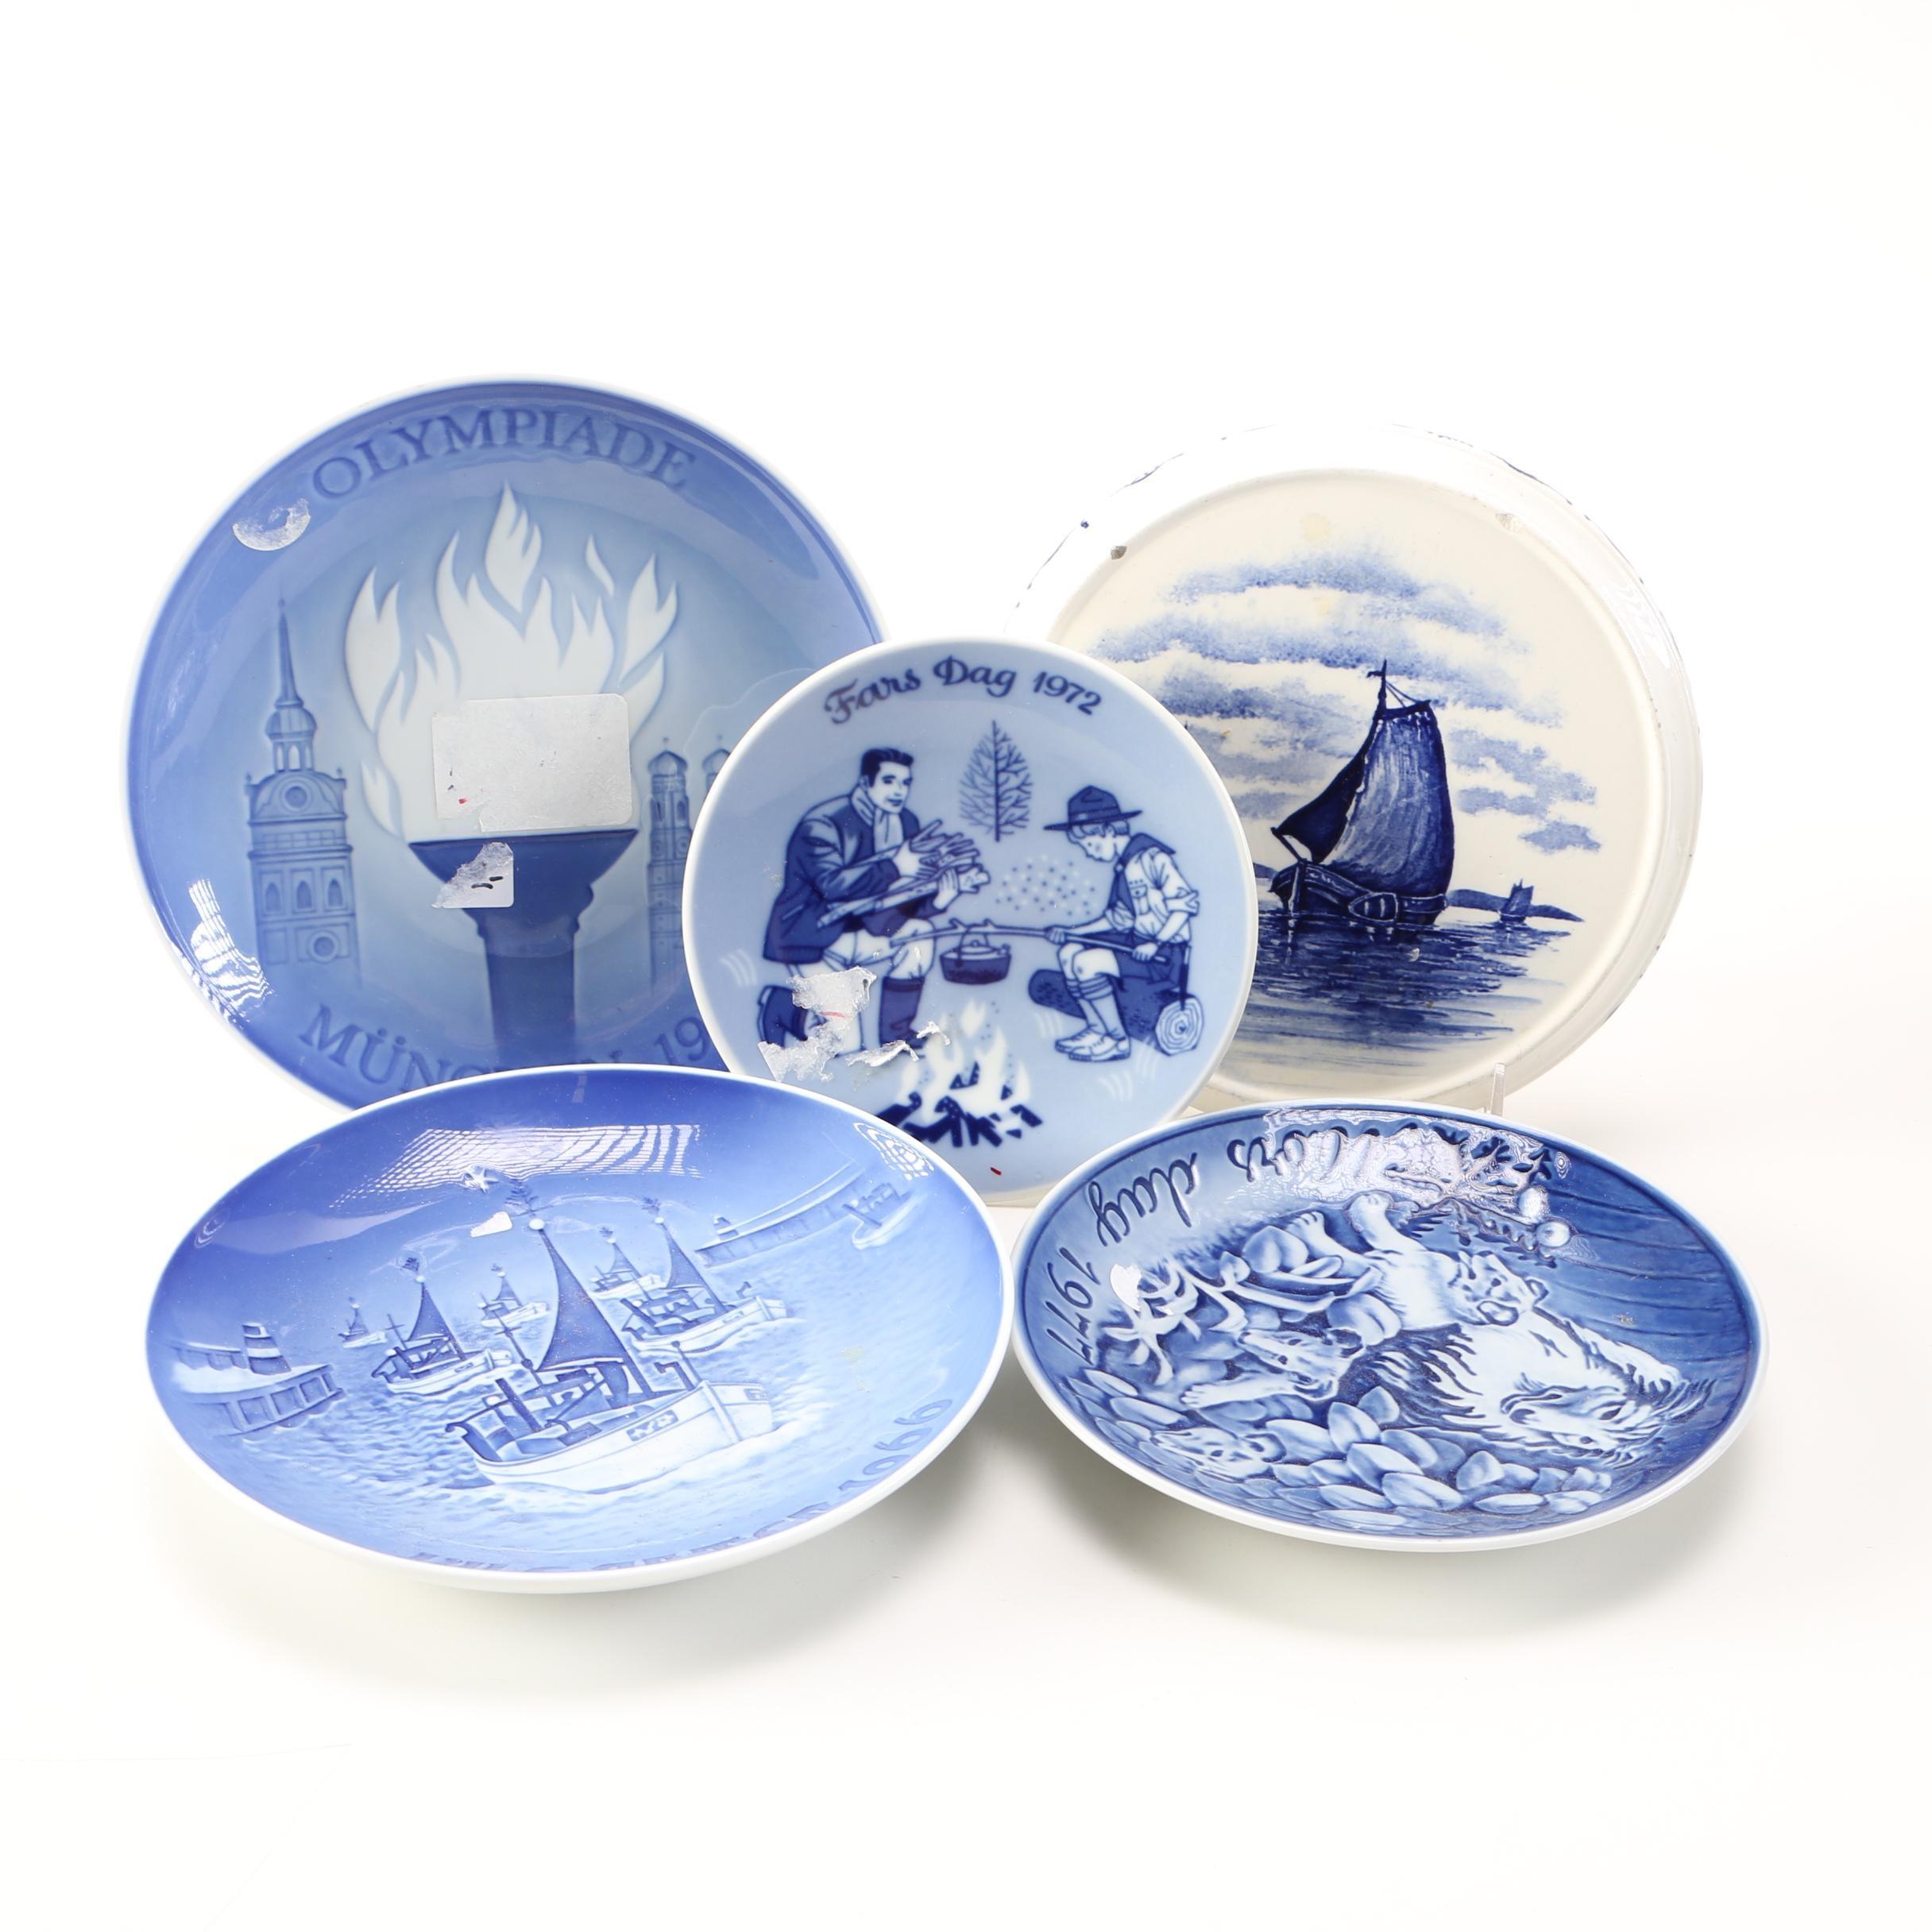 Blue and White Decorative Commemorative Plates Featuring B \u0026 ...  sc 1 st  EBTH.com & Blue and White Decorative Commemorative Plates Featuring B \u0026 G : EBTH